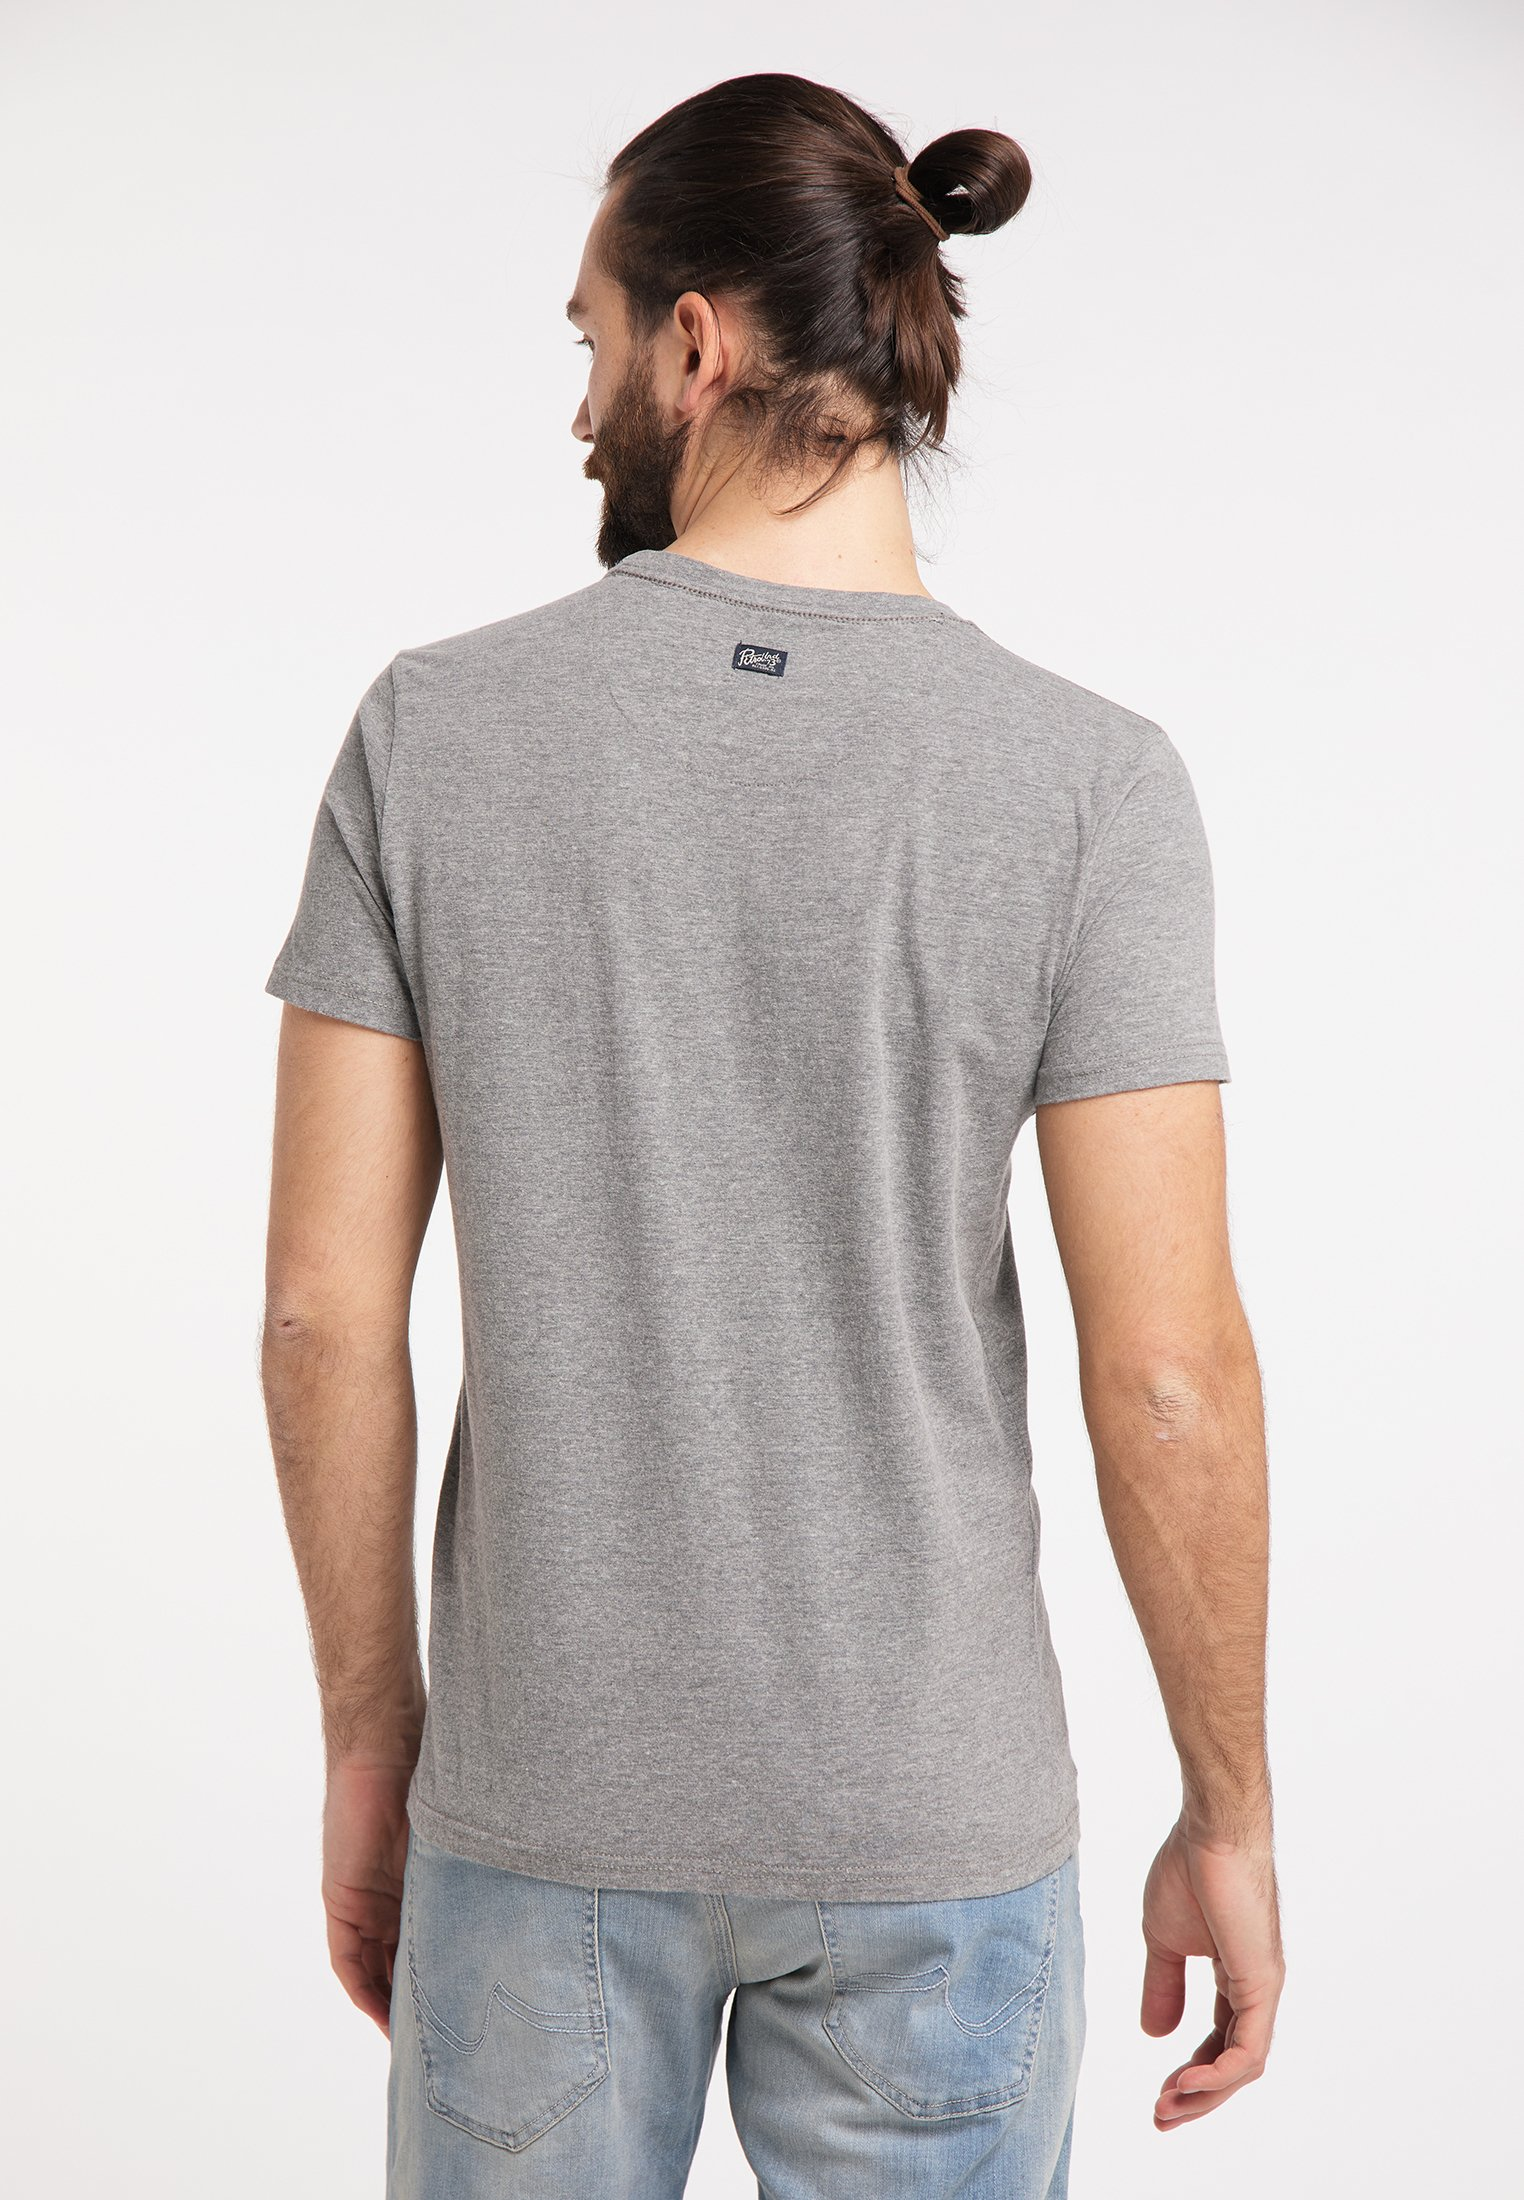 Petrol Industries Print T-shirt - grey 9Cf0z